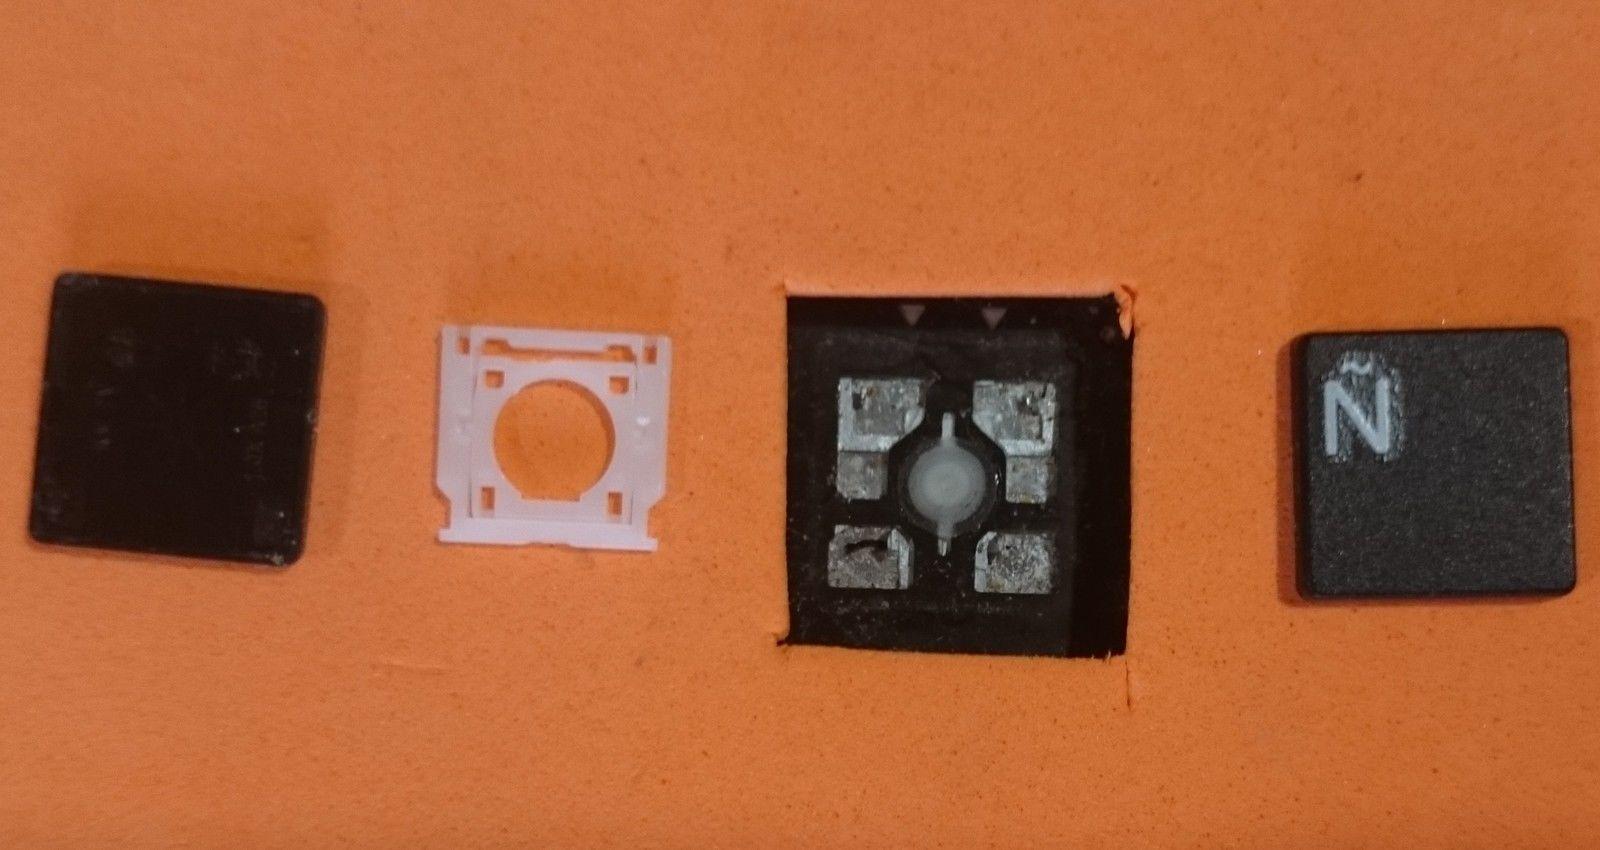 TECLA TECLAS DE TECLADO TOSHIBA SATELLITE C850 C850D C855C 855D L850 L850D L870